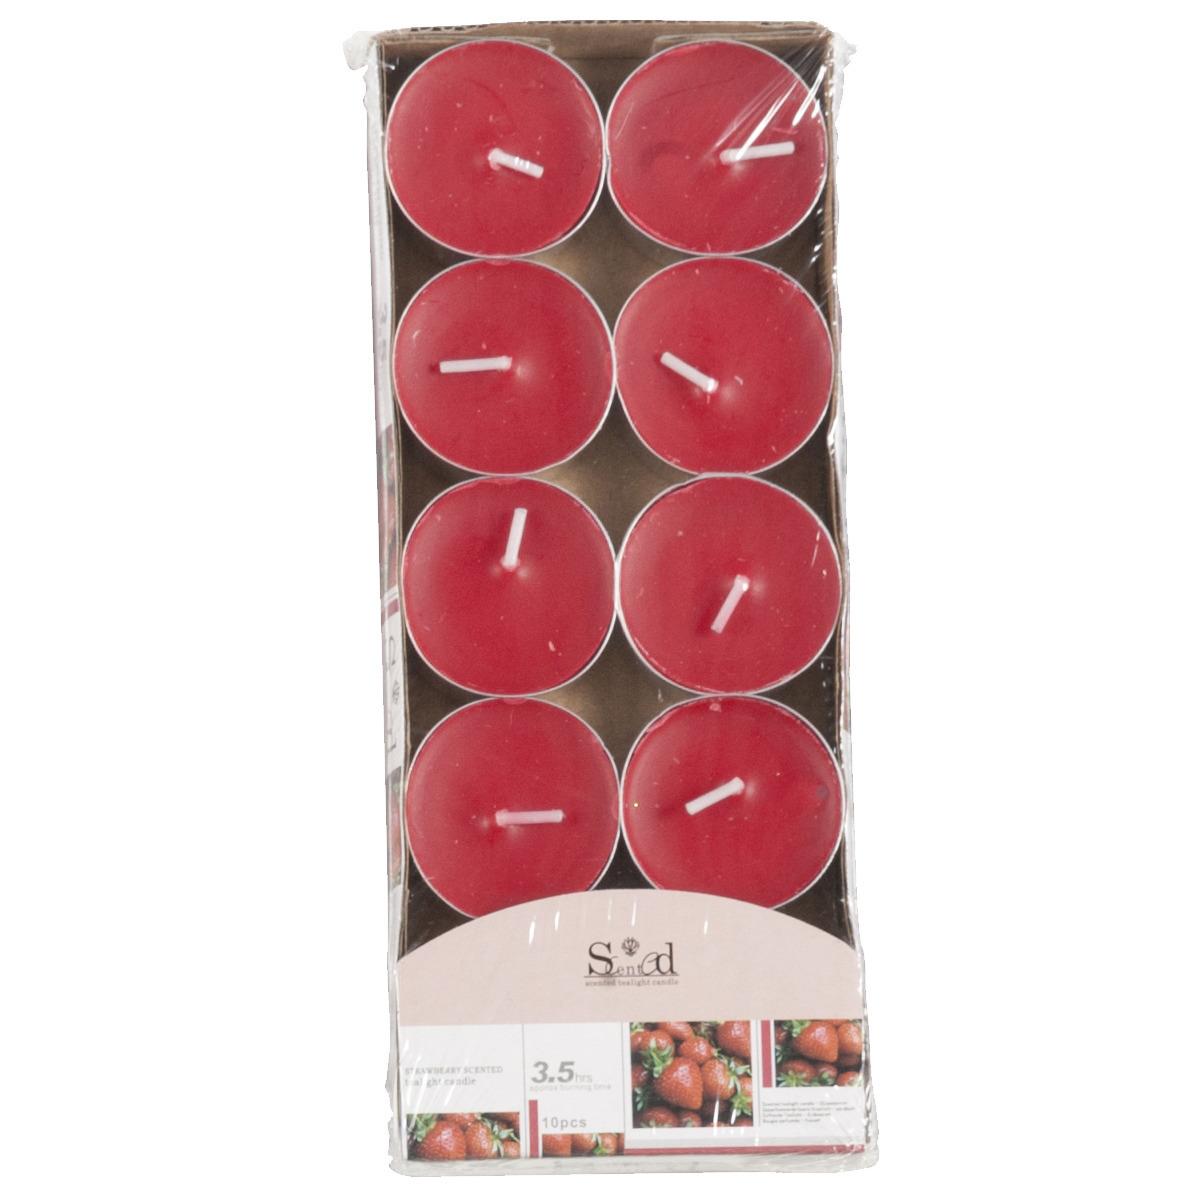 Image of Geur theelichtjes aardbei rood 10 stuks